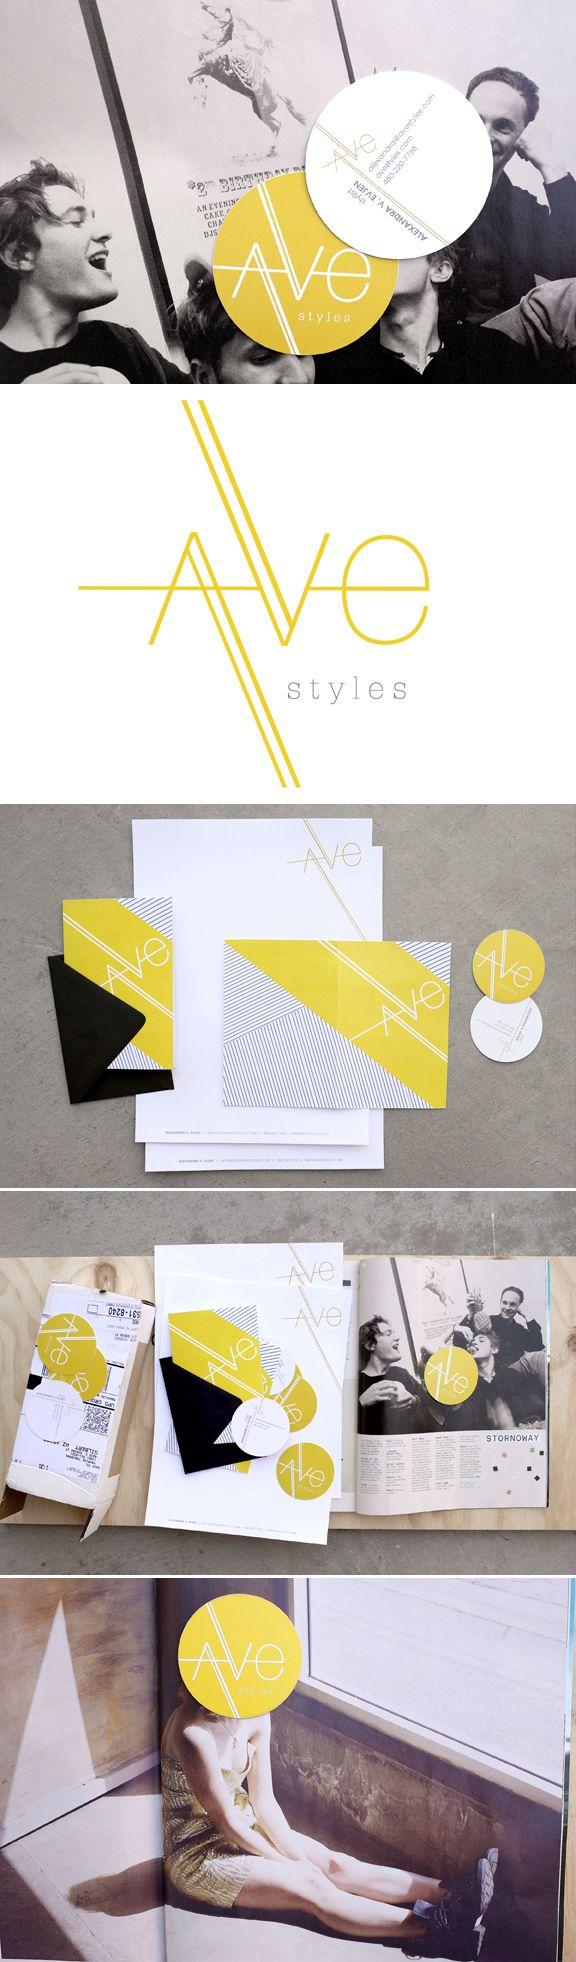 Ave Styles branding by Promise Tangeman